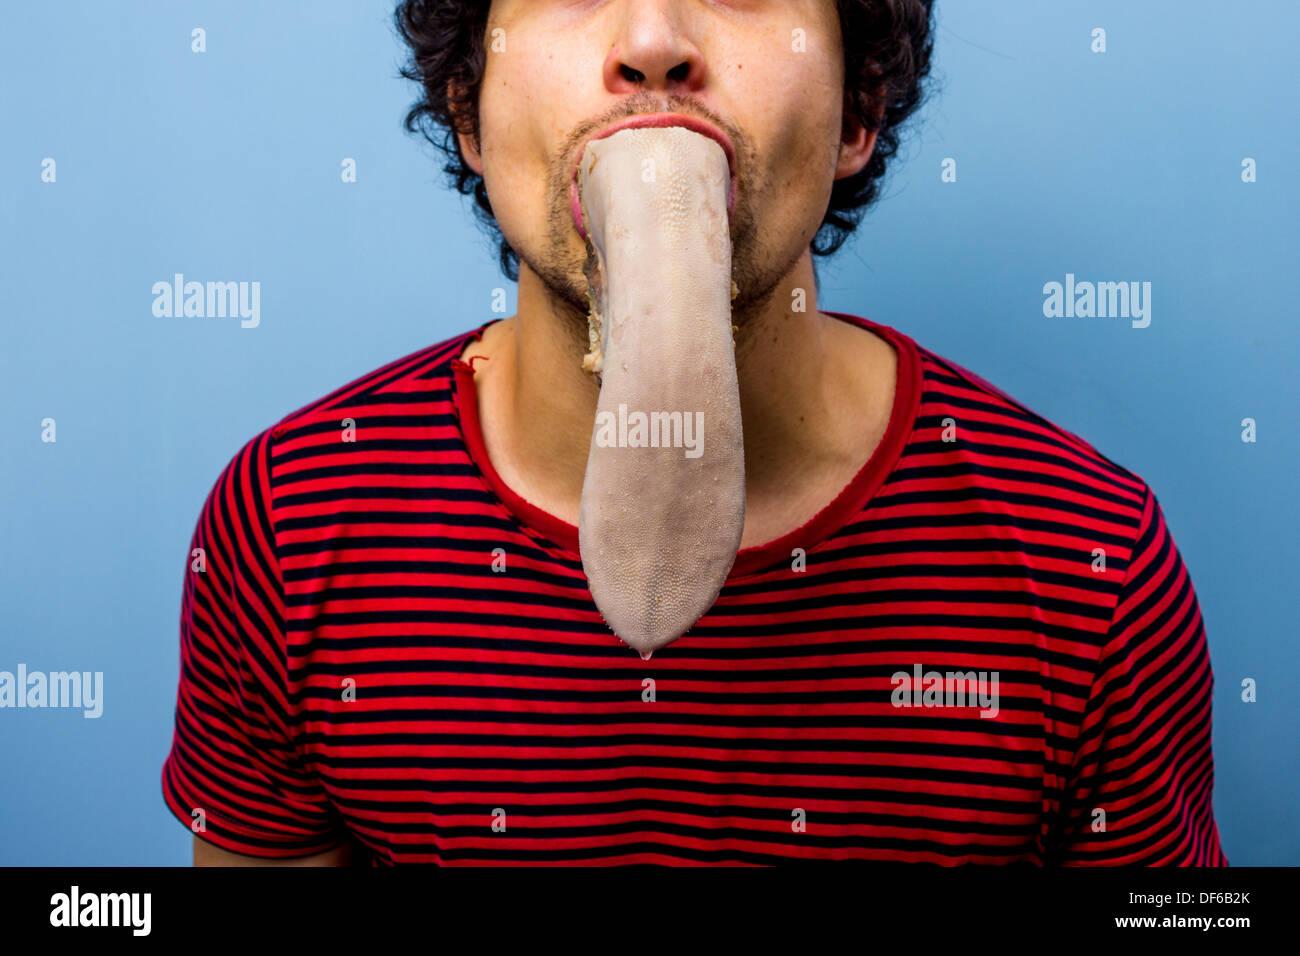 Чувака в рот, Ебут в рот русских девушек на 12 фотография